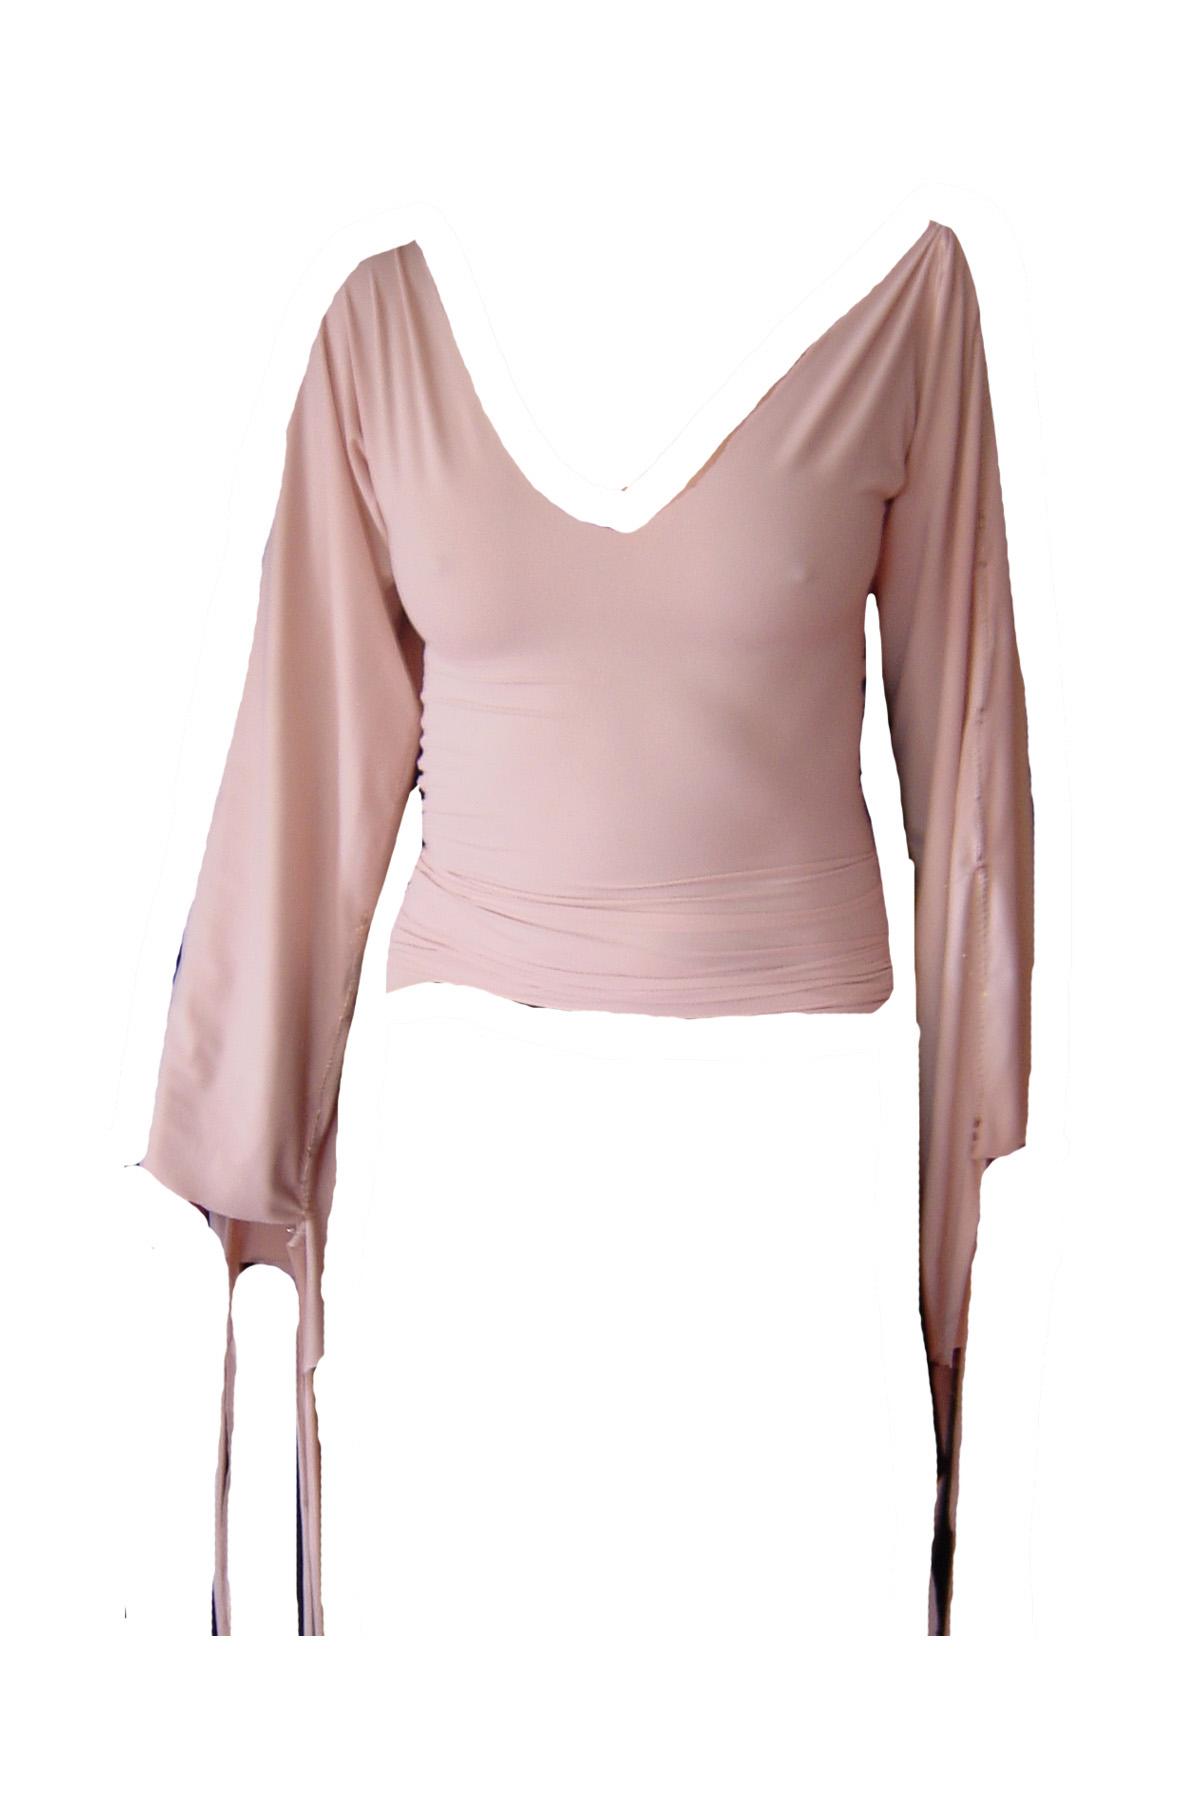 pink bell top.jpg